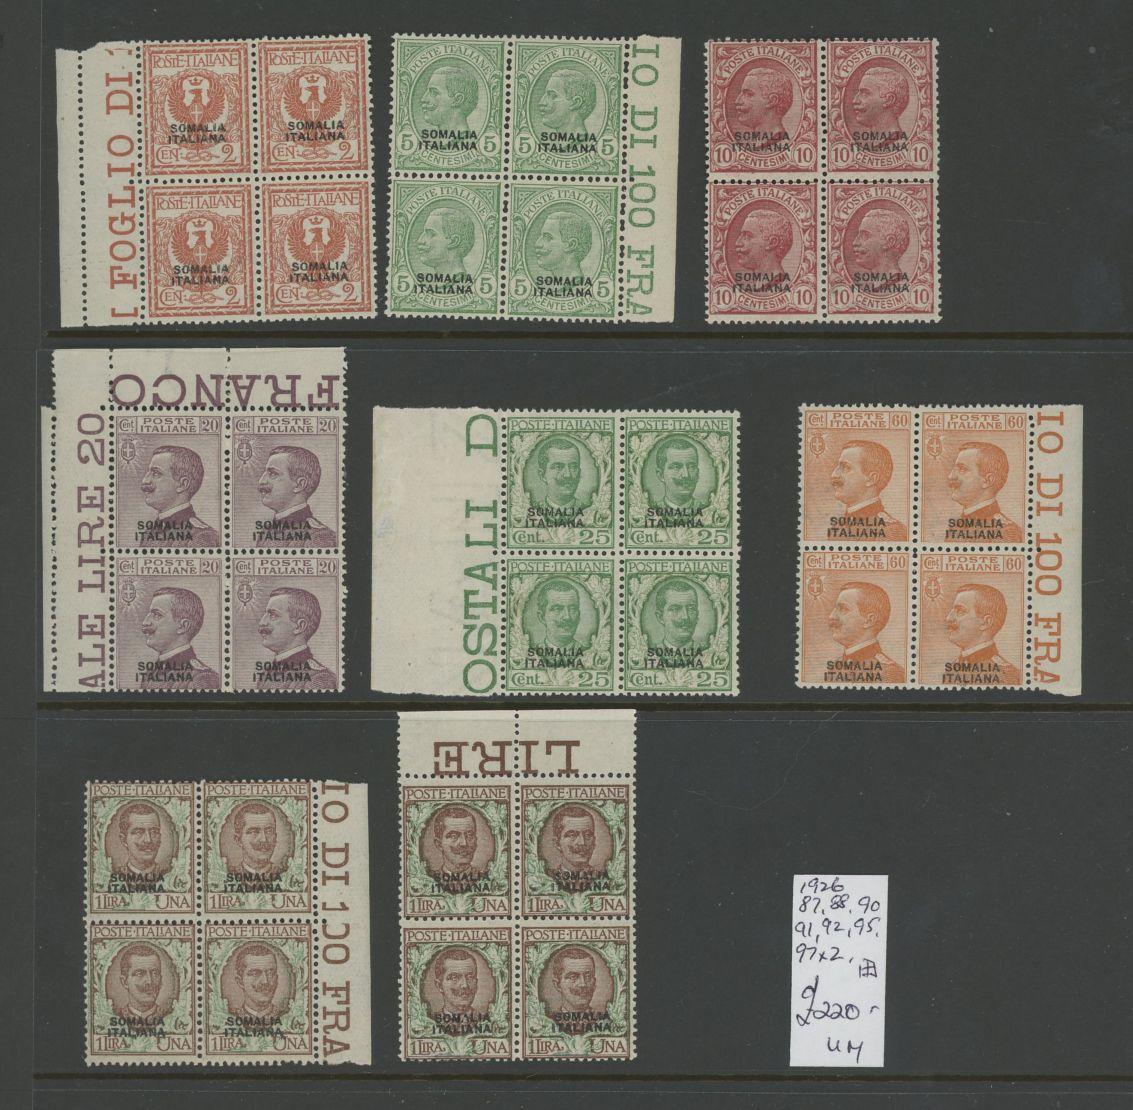 Somalia: 1926-30 2c orange-brown, 5c green, 10c rose, 20c purple, 25c green & yellow-green,